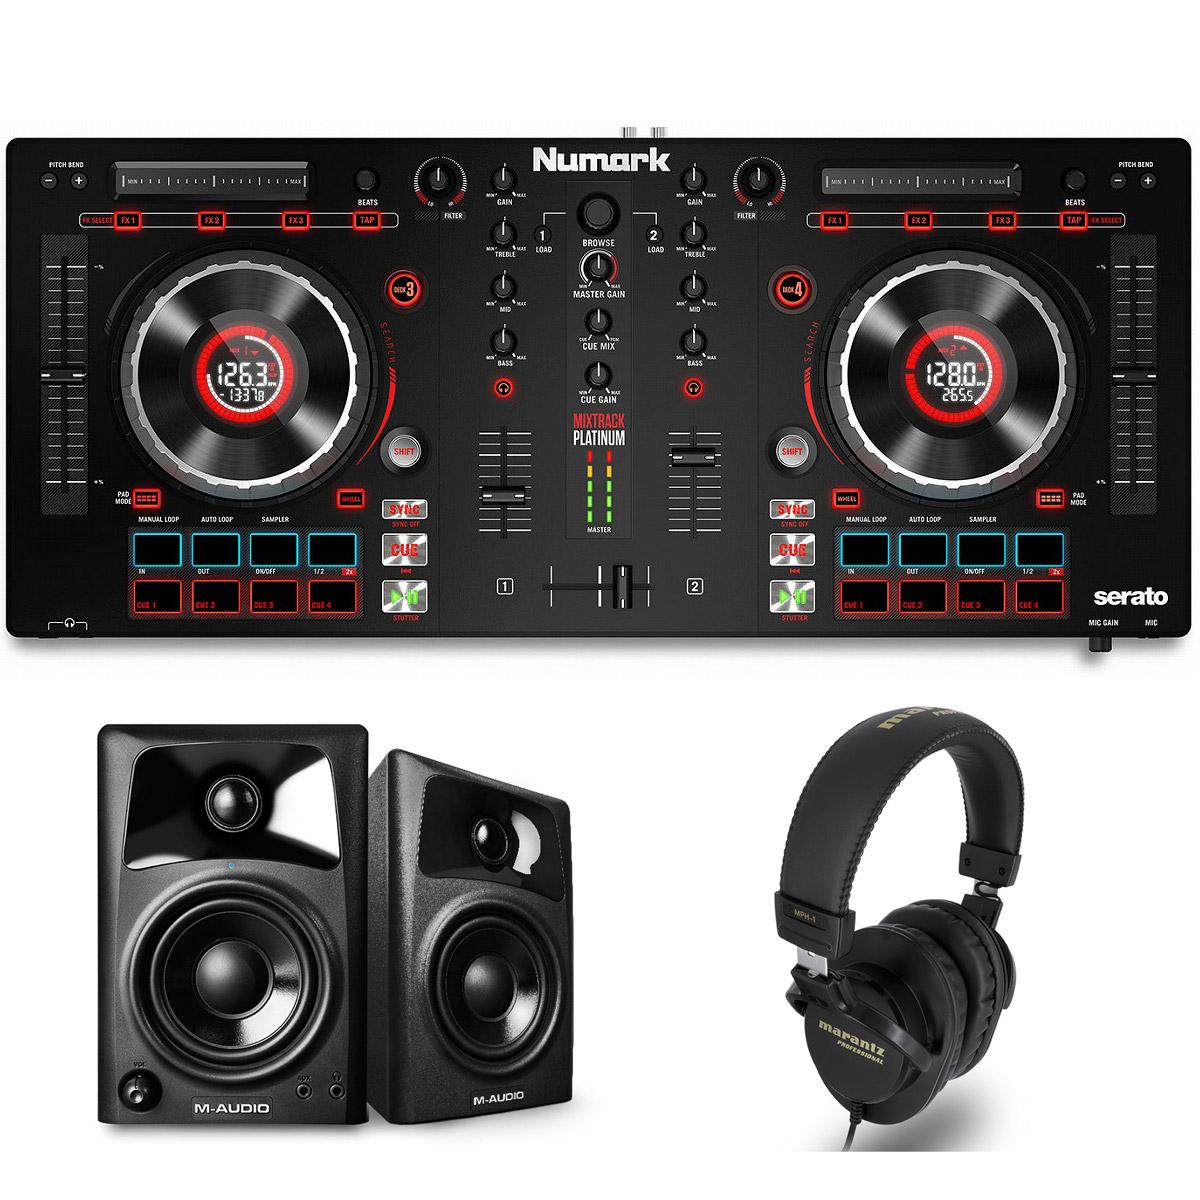 Numark / Mixtrack Platinum START DJセット【SCRATCH音ネタ入りUSBメモリーサービス!】【お取り寄せ商品】【渋谷店】